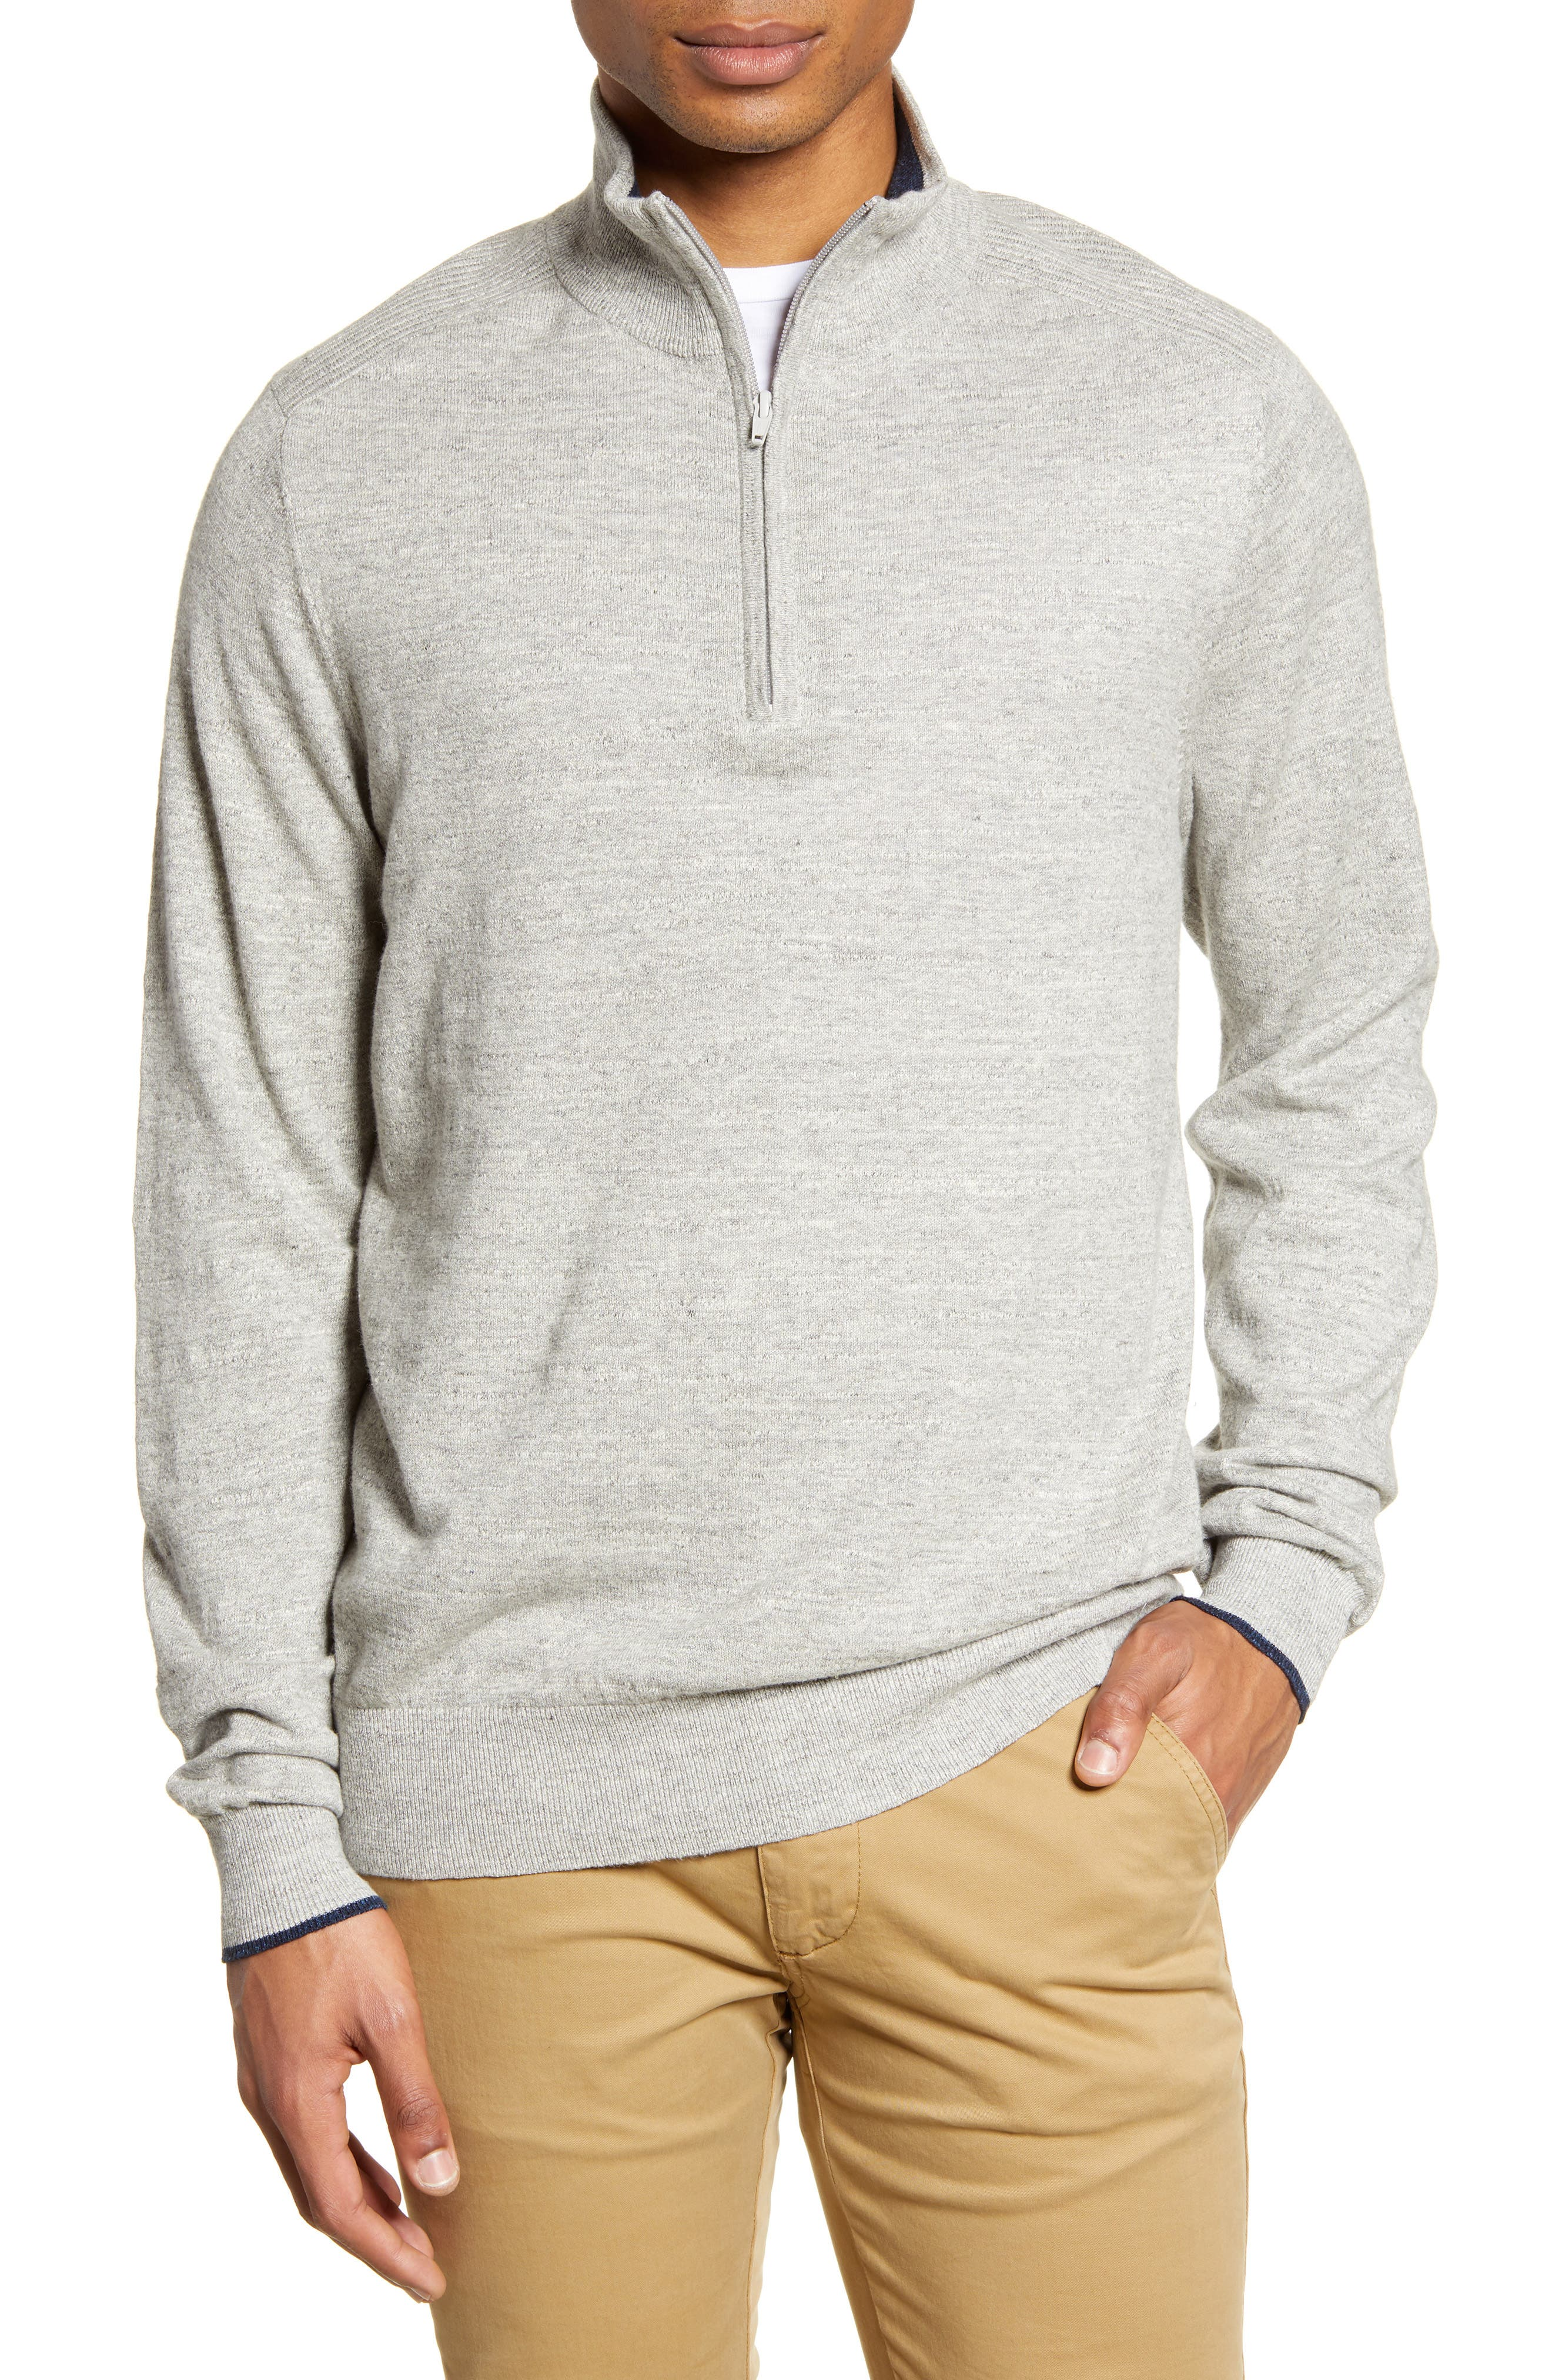 Image of RODD AND GUNN Harley Cotton Quarter Zip Sweater